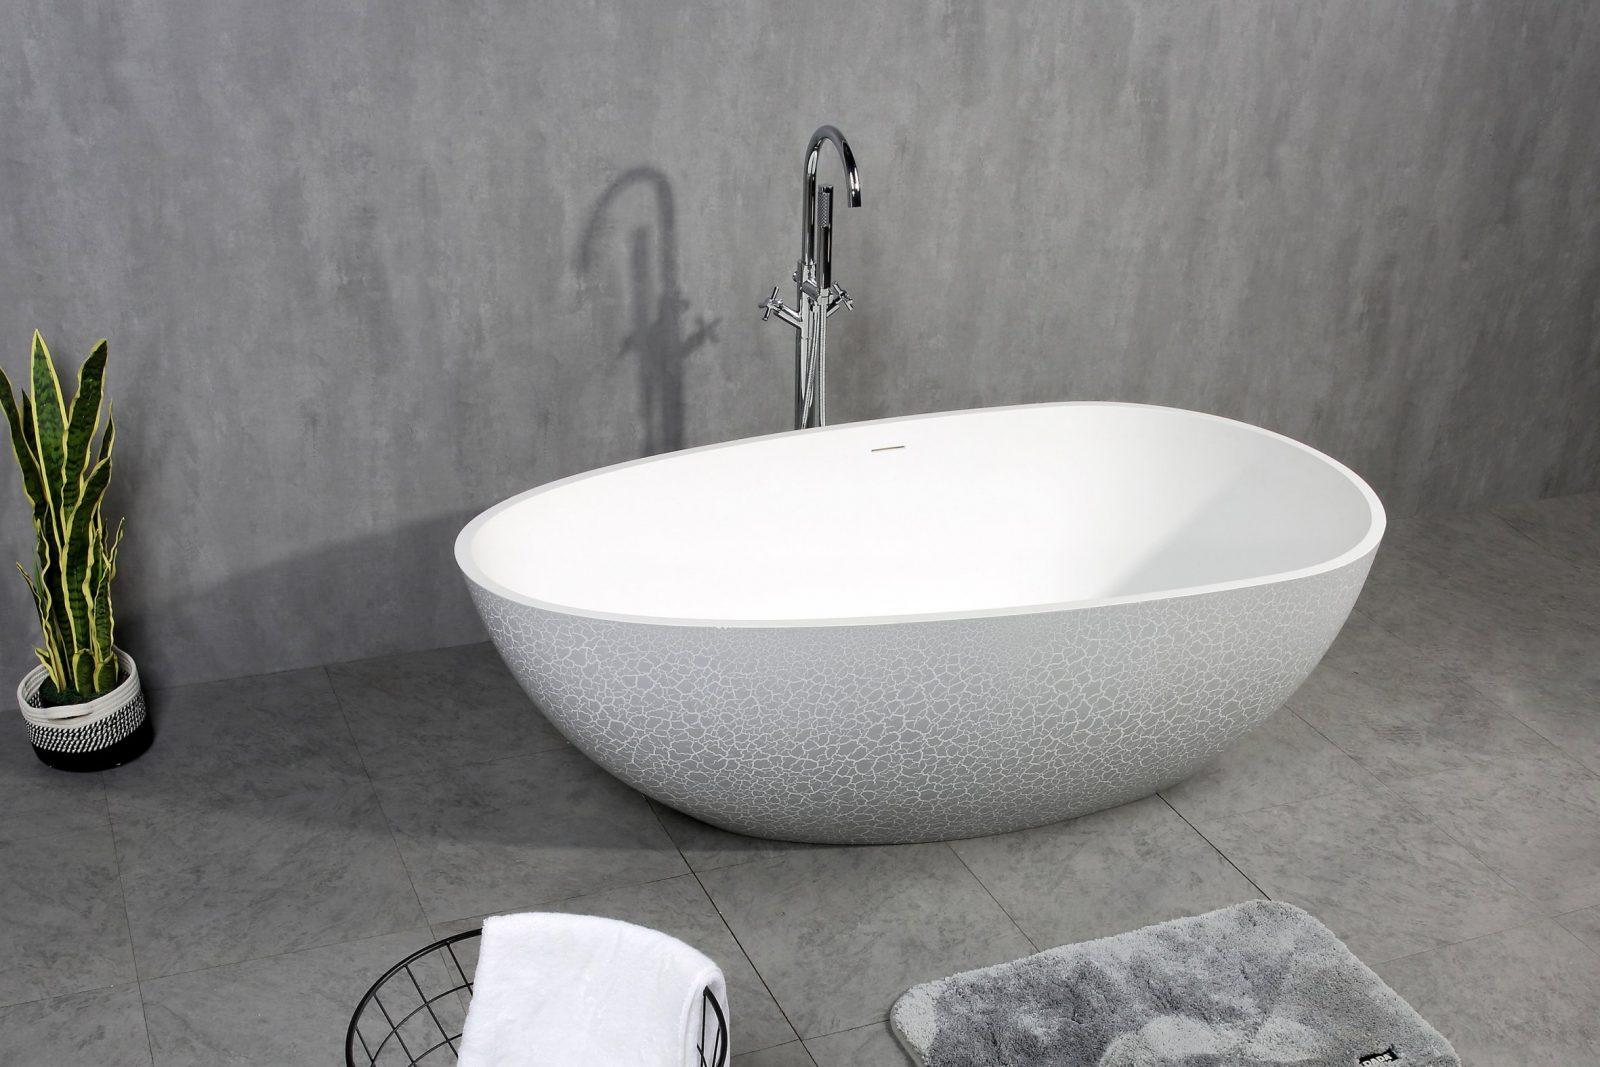 Freistehende Badewanne Aus Mineralguss Oceania  170X85Cm von Freistehende Badewanne Mineralguss Oder Acryl Bild